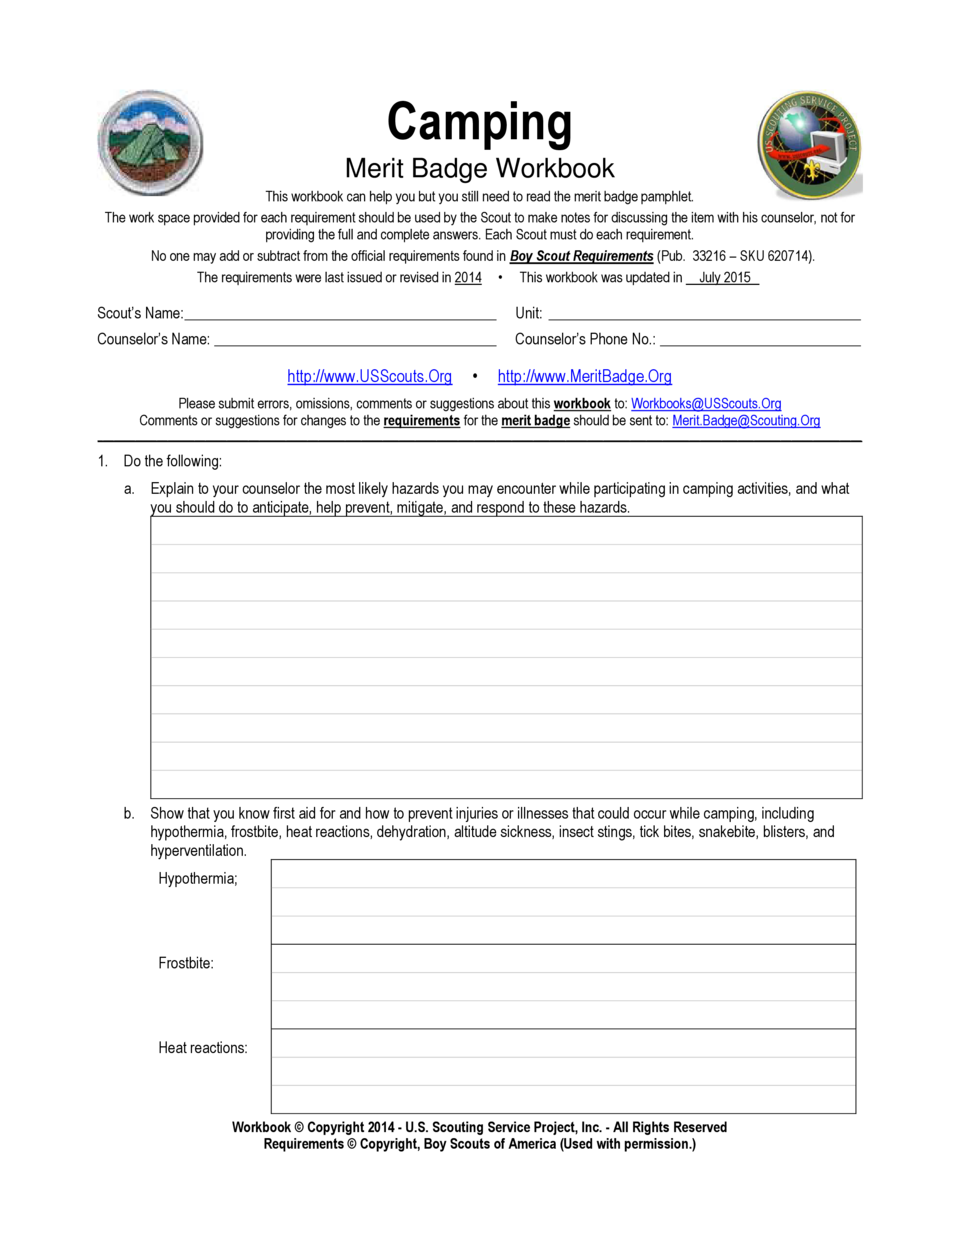 Cooking Merit Badge Worksheet Answers